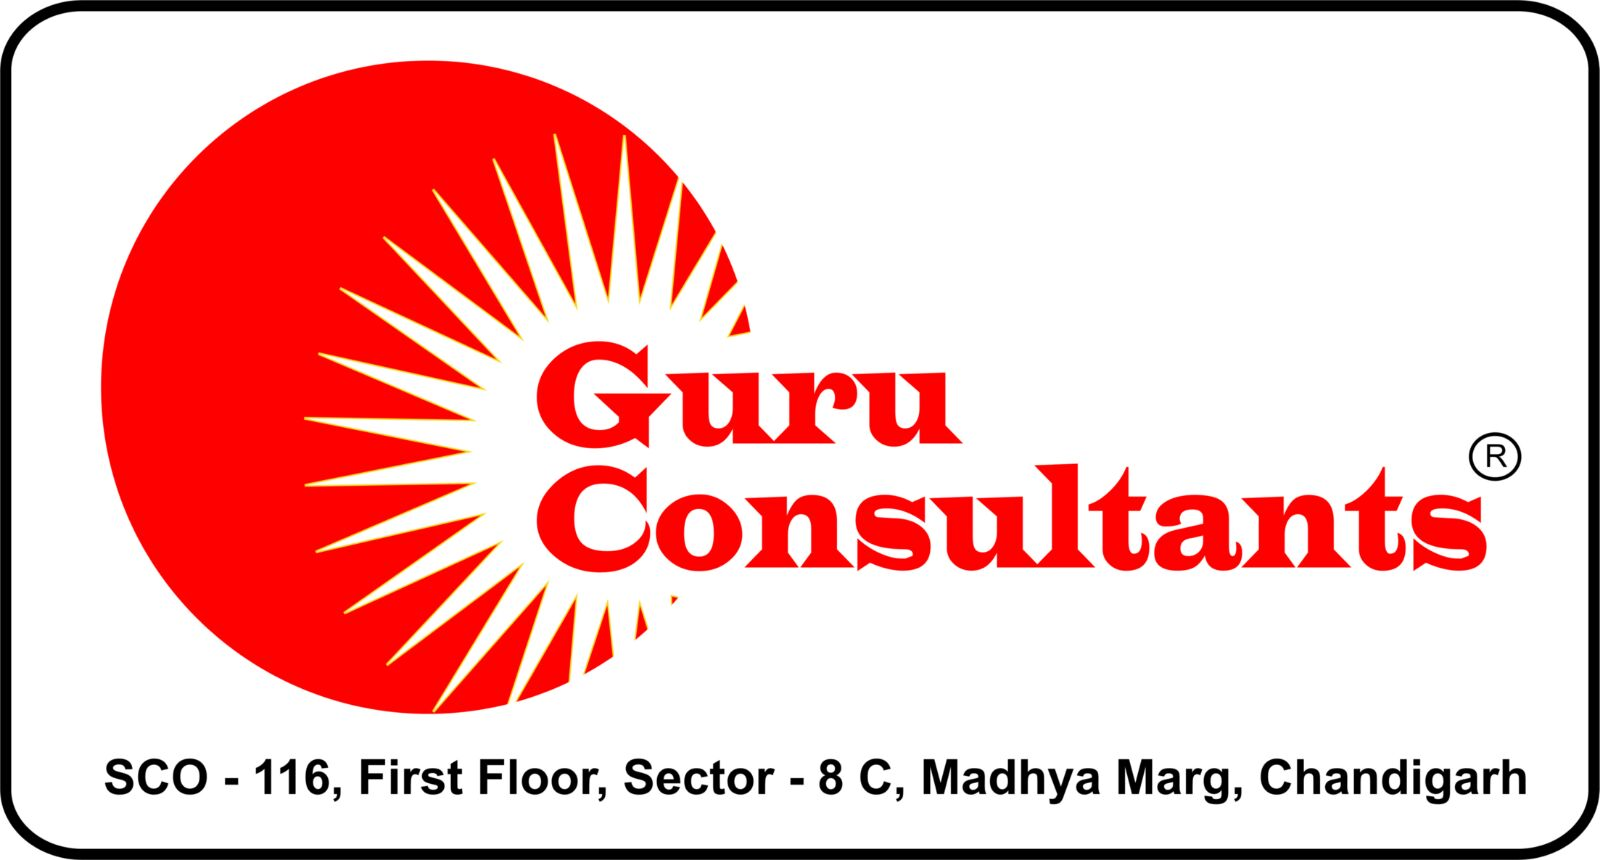 Guru Consultants